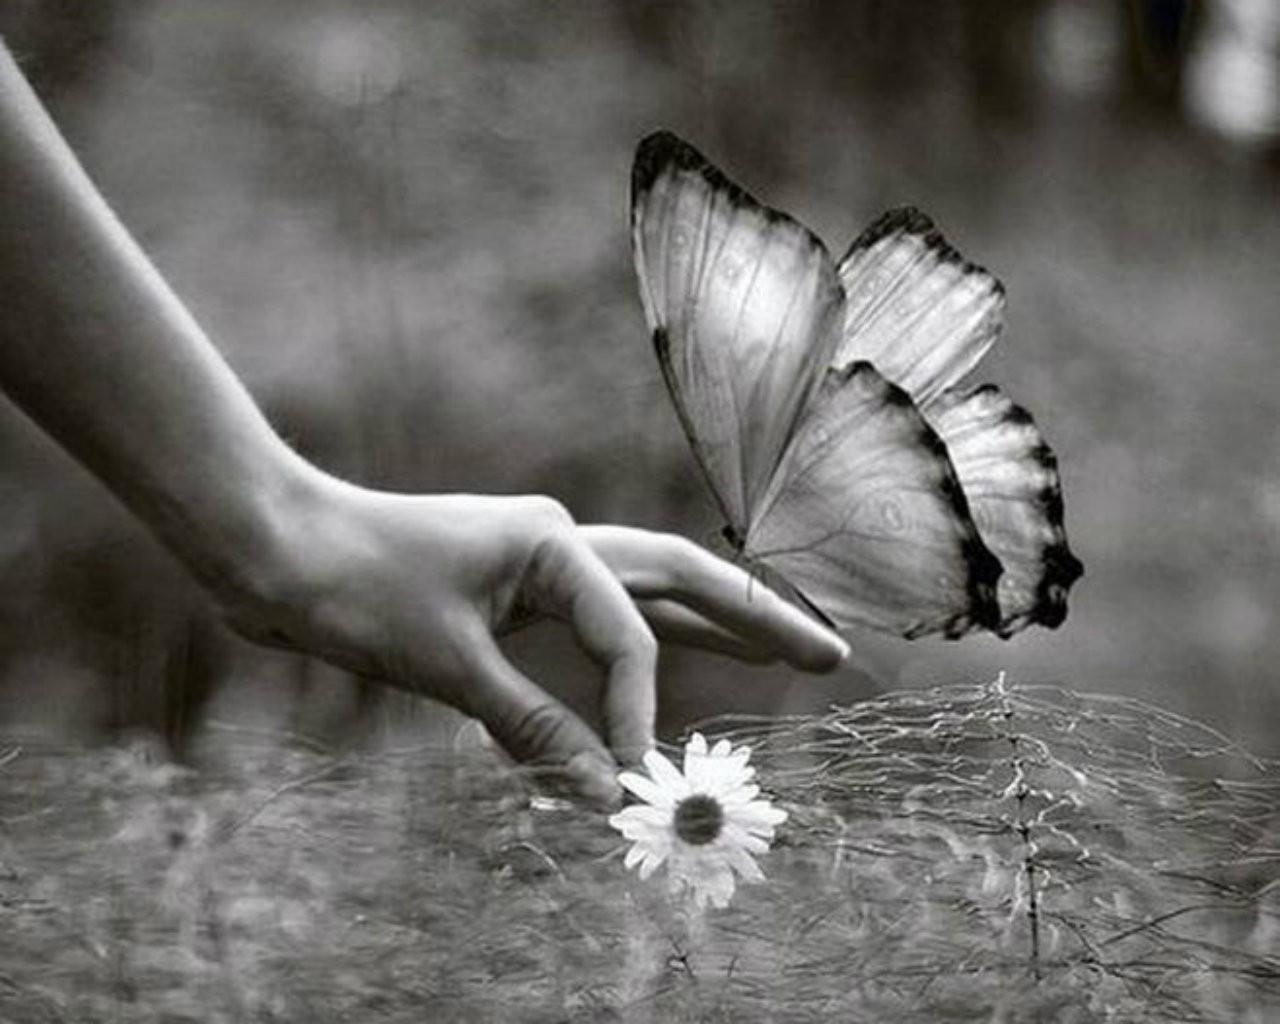 Flower White Butterfly Black Hand Wallpaper Pictures - Flower Butterfly Black And White , HD Wallpaper & Backgrounds